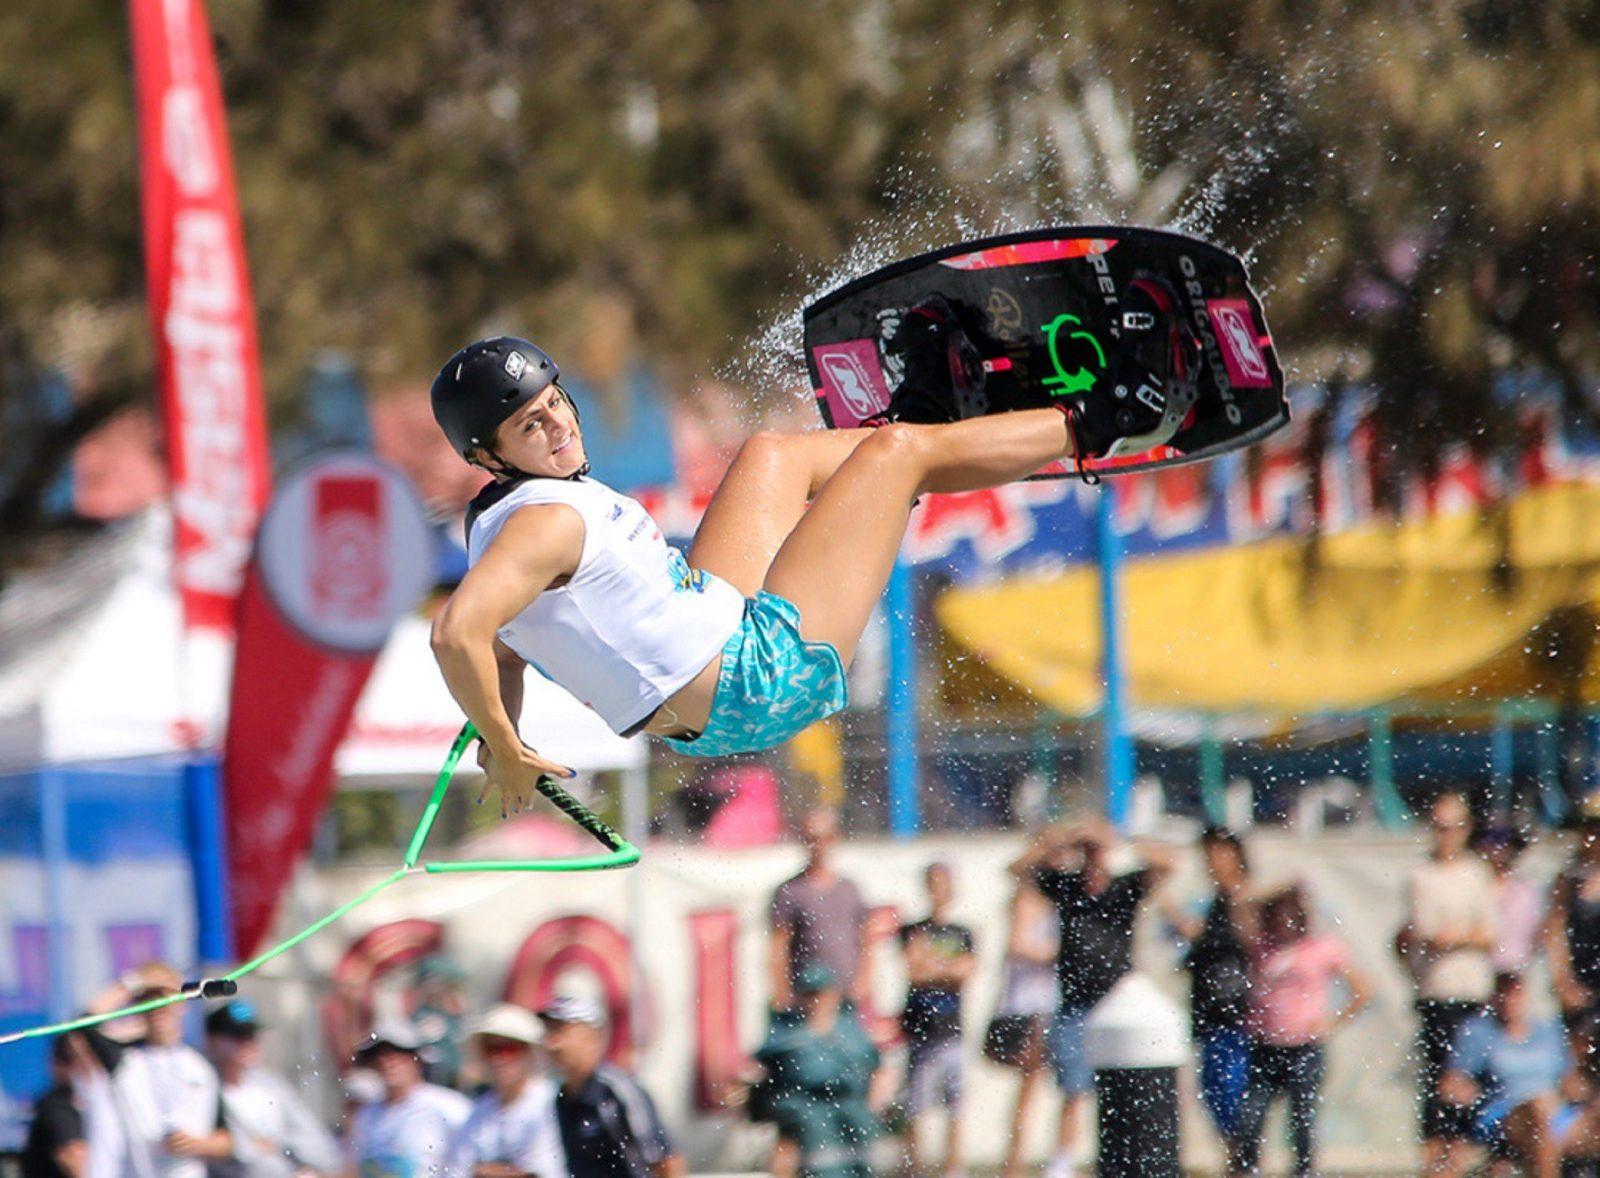 Action Sports Games 2019, Bunbury, Western Austsralia